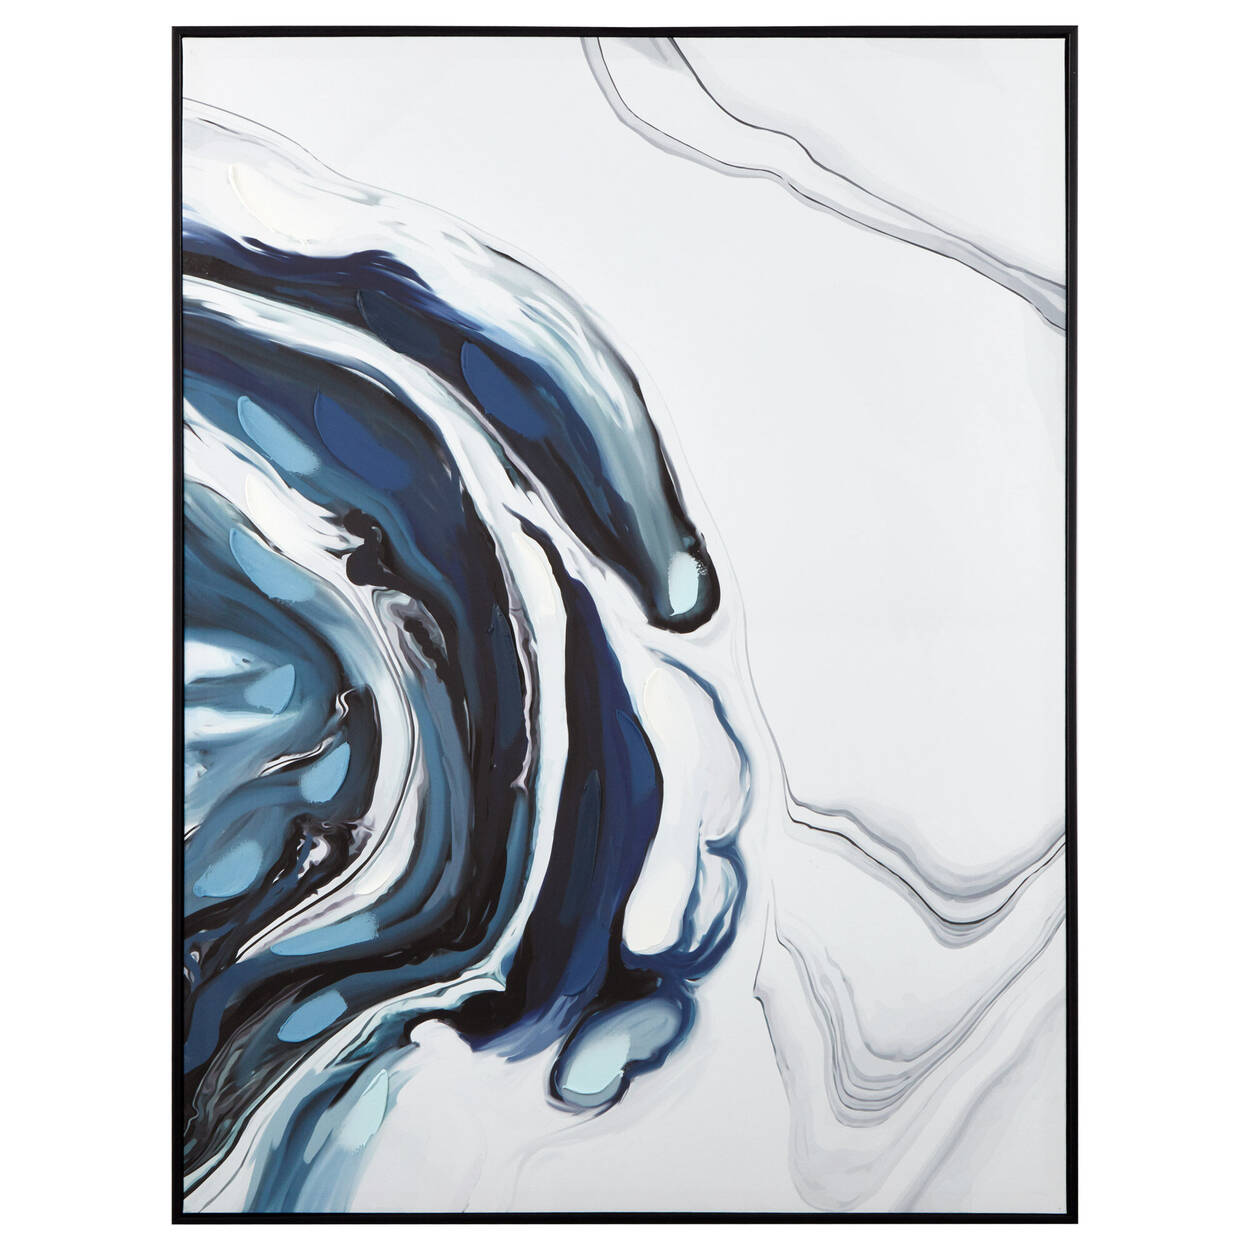 Cadre marbre abstrait embelli au gel